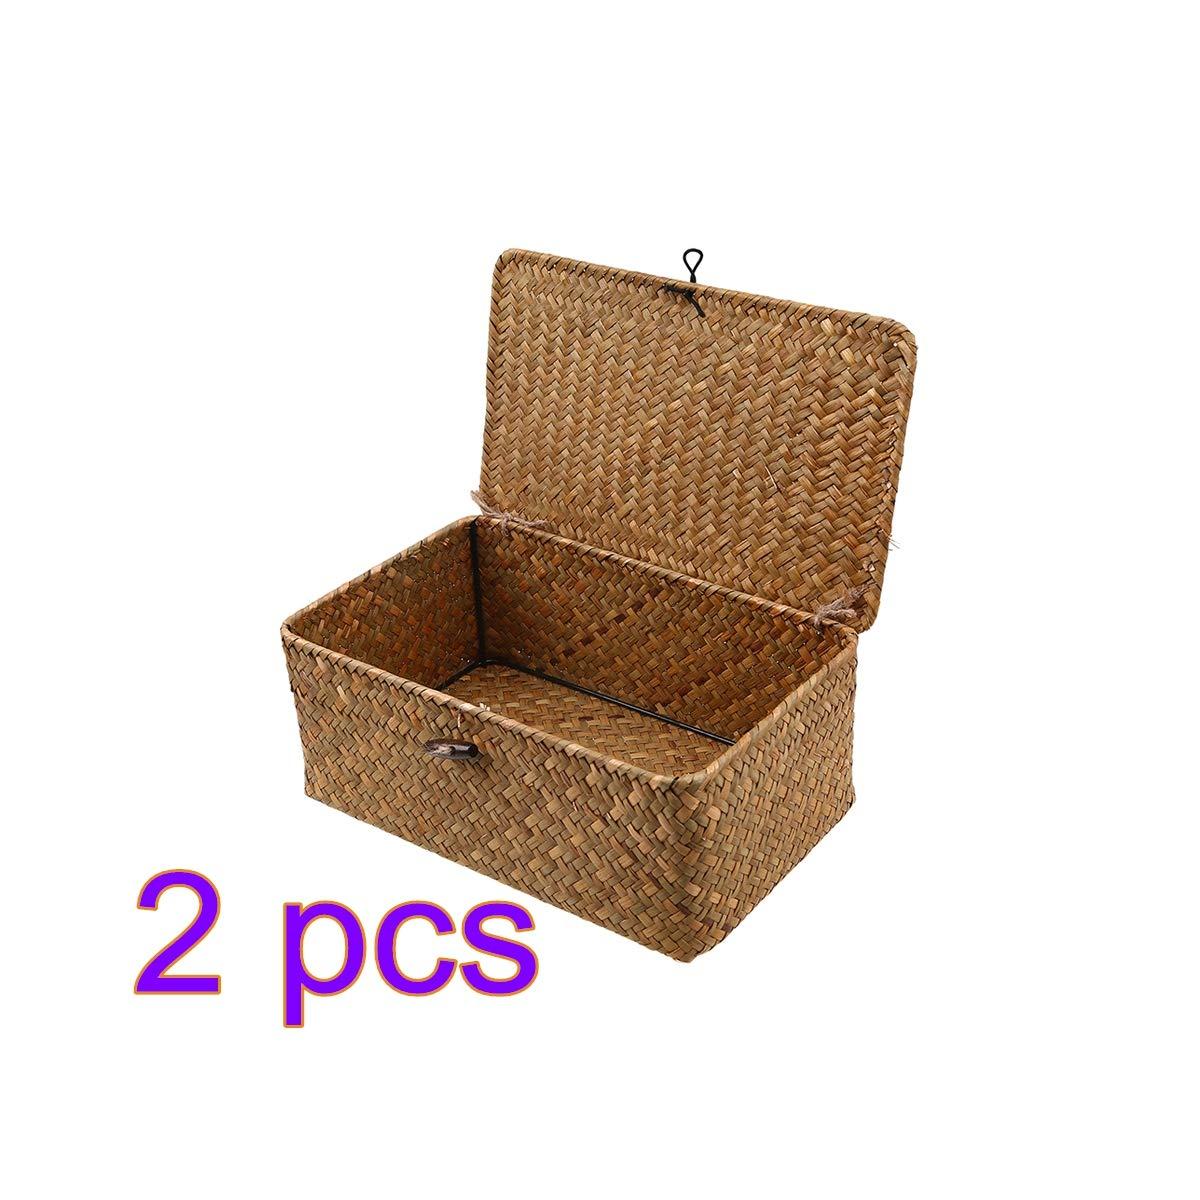 Vosarea Rattan Storage Basket Makeup Organizer Multipurpose Container with Lid Size S 2pcs